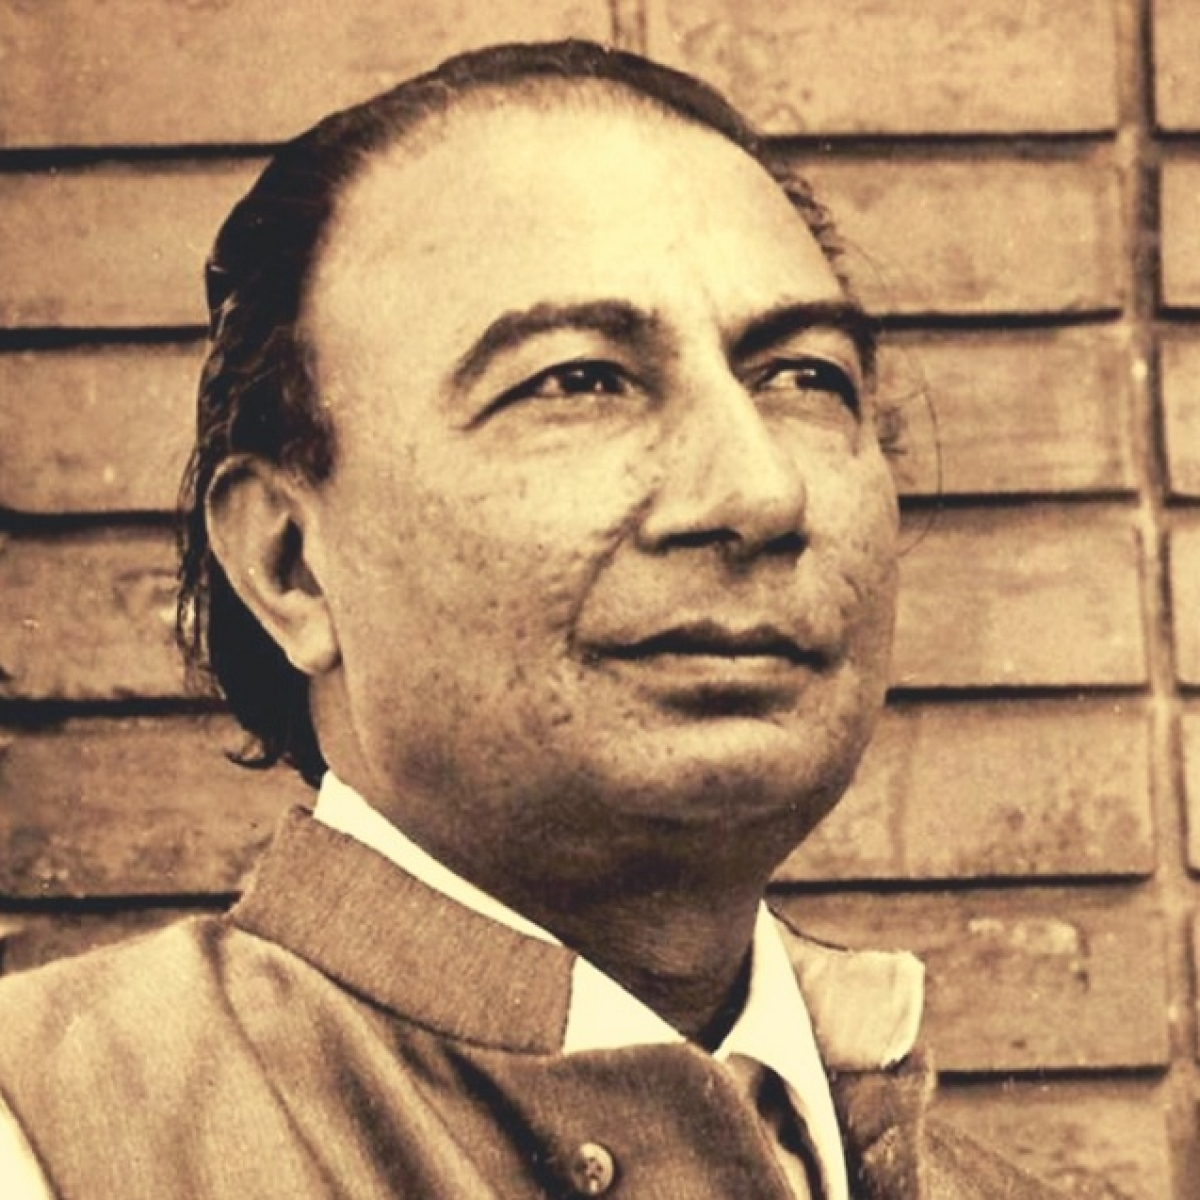 Remembering Sahir Ludhianvi on his birth centenary: The man who chose to challenge